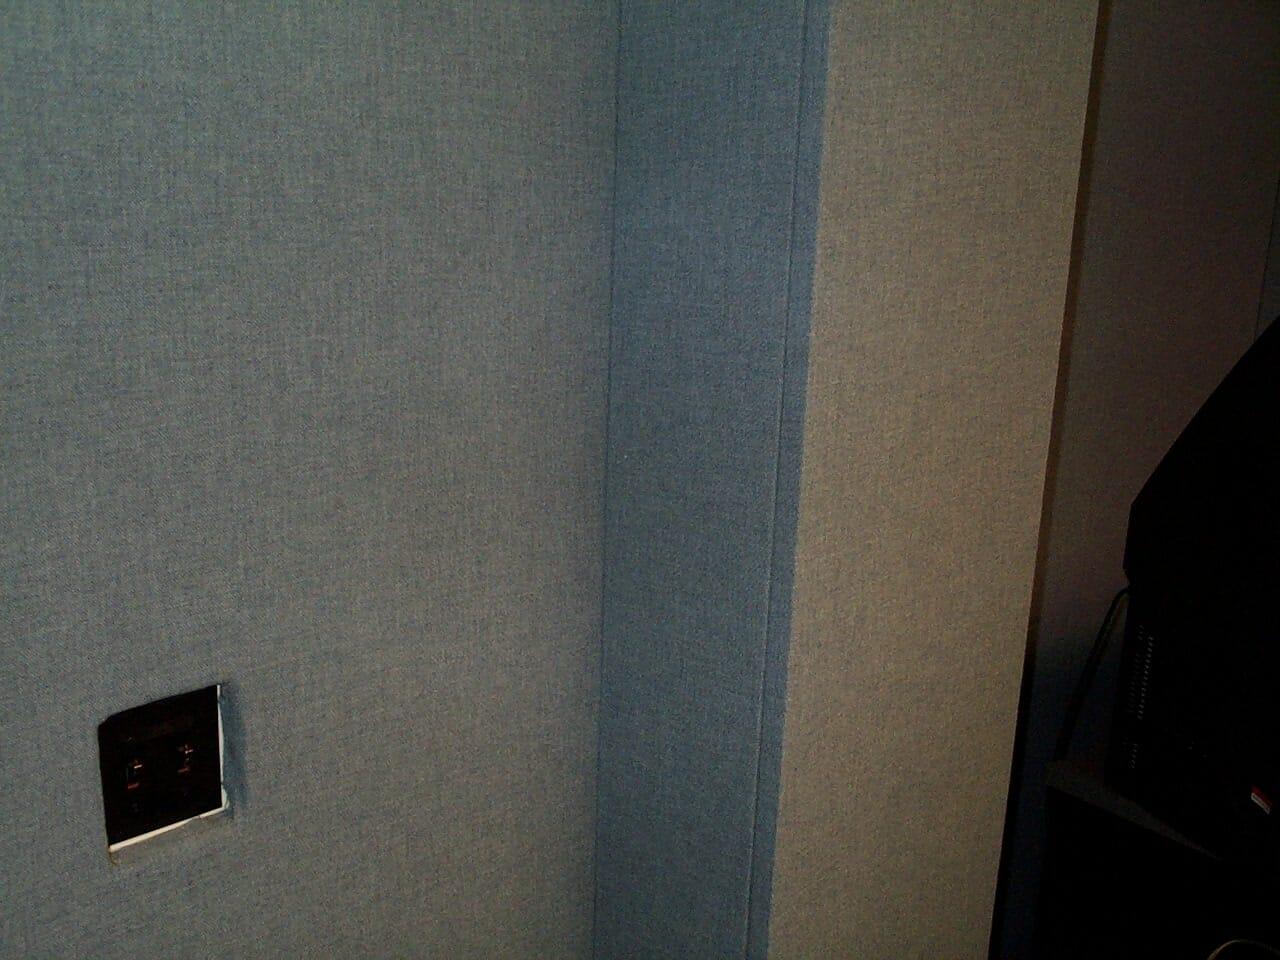 game testing room acoustics